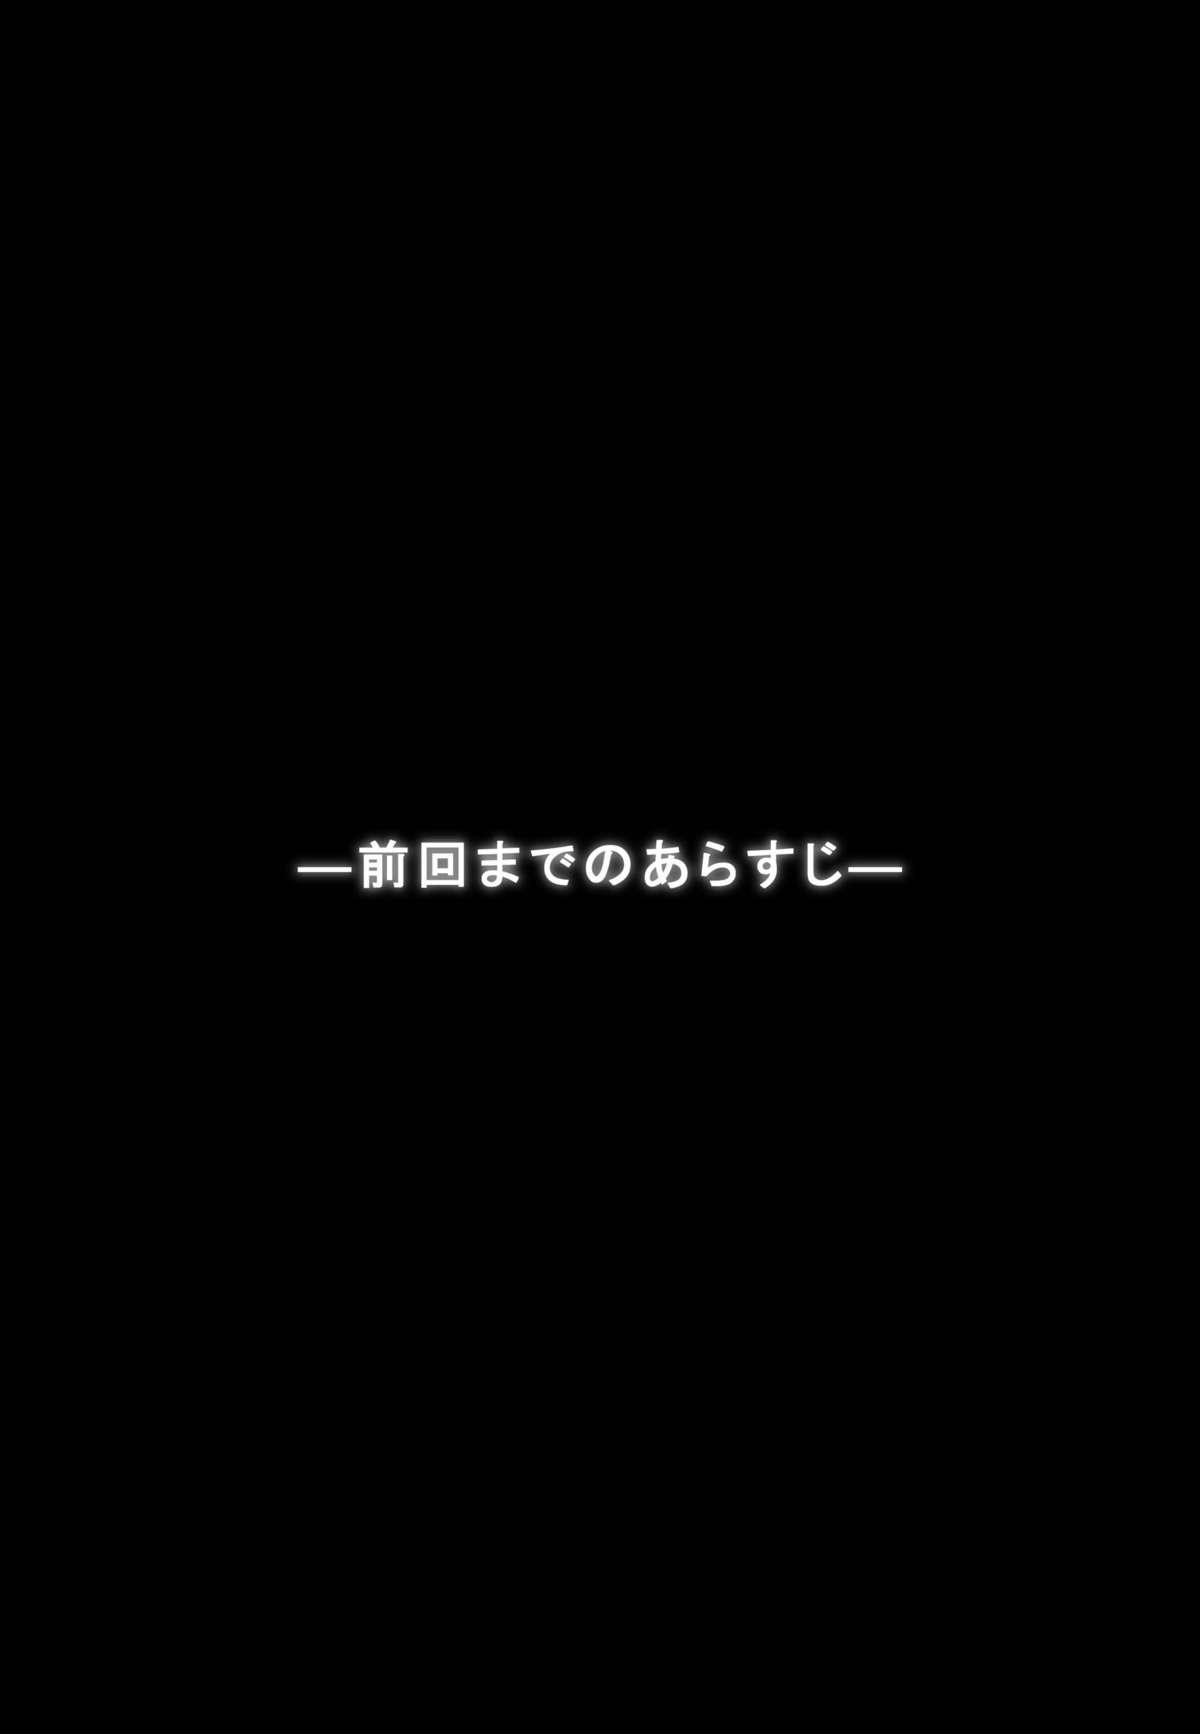 [Macxe's (monmon)] Tokubousentai Dinaranger ~Heroine Kairaku Sennou Keikaku~ Vol.01/02/03 (Renkaban) [Digital] 37